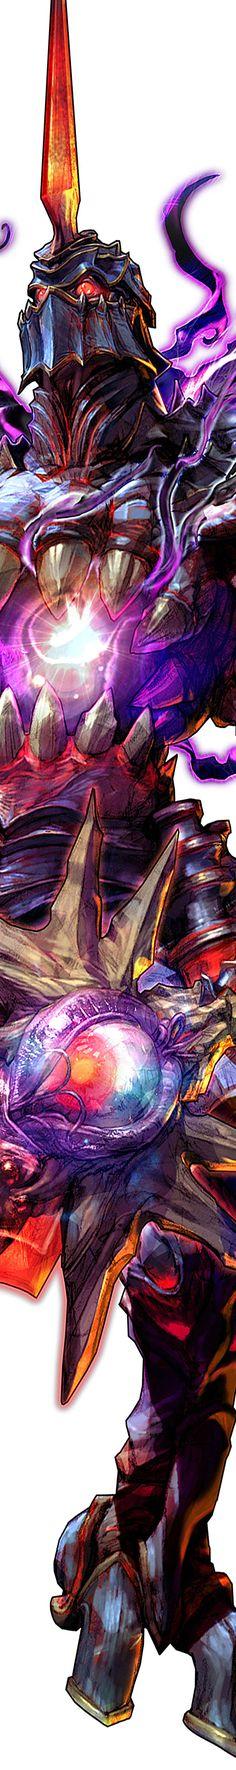 Soul Calibur - Nightmare